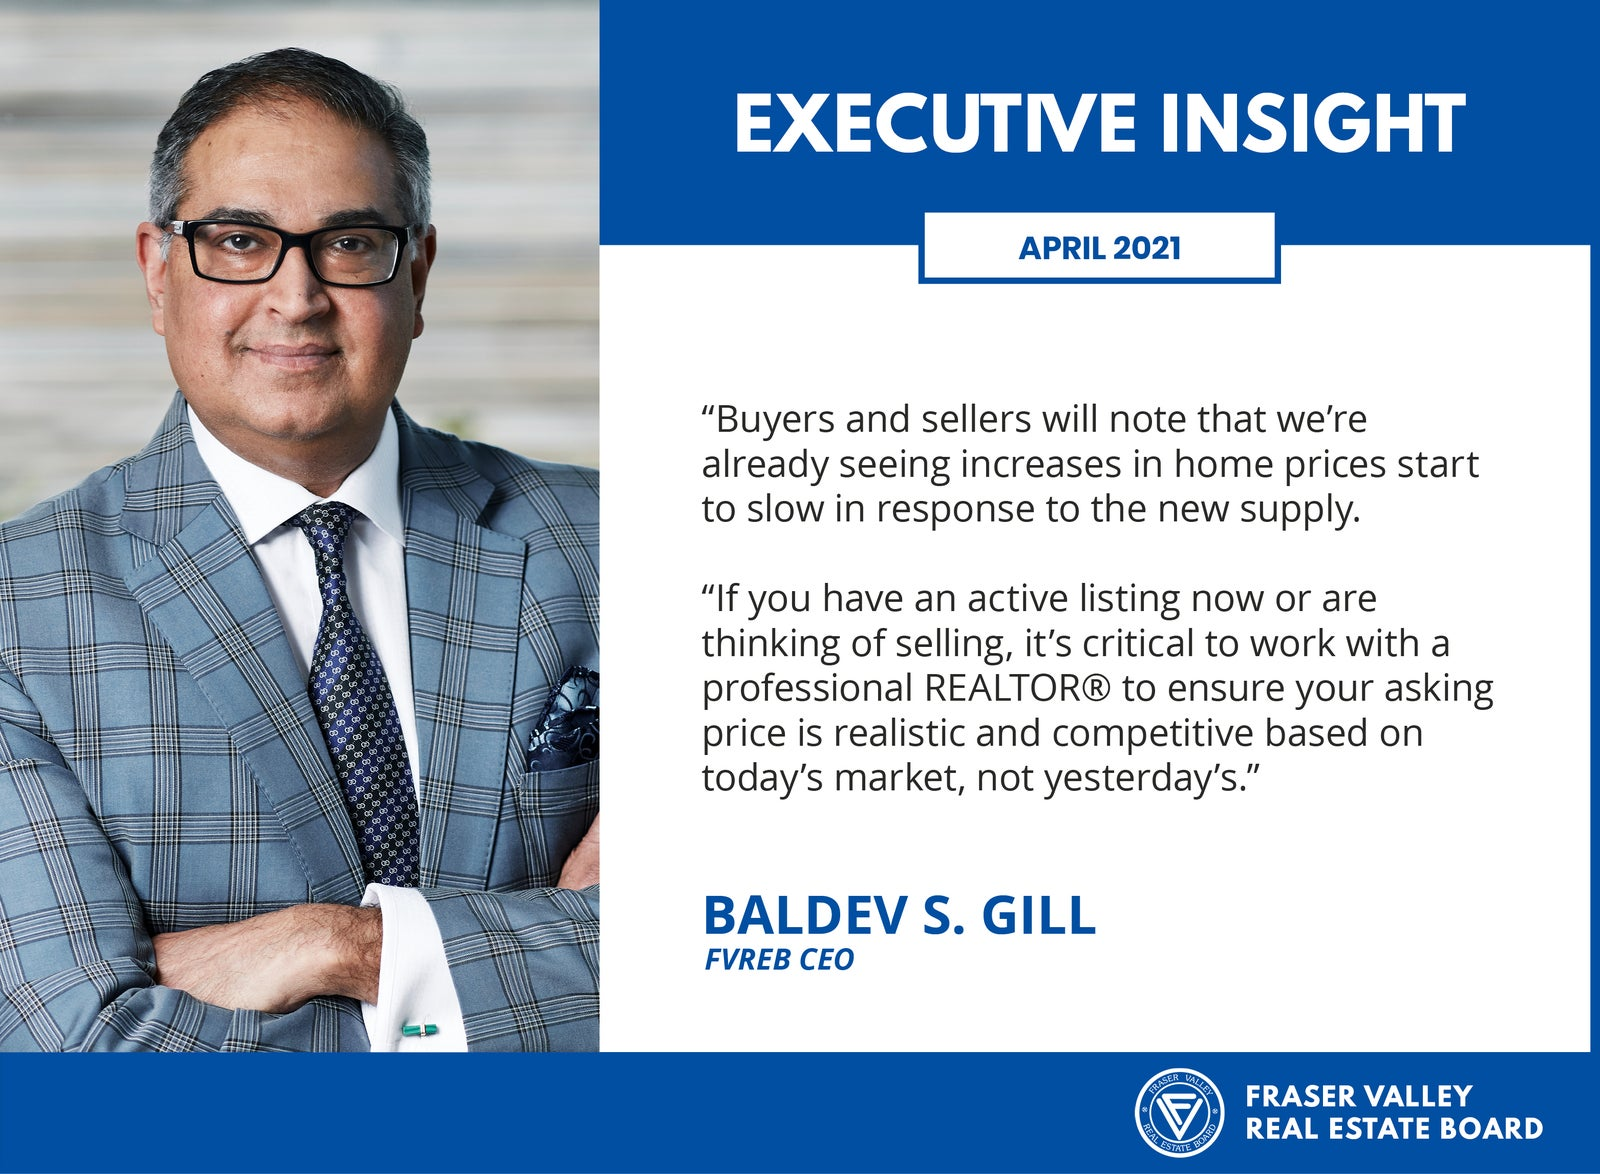 FVREB Executive Insight - April 2021